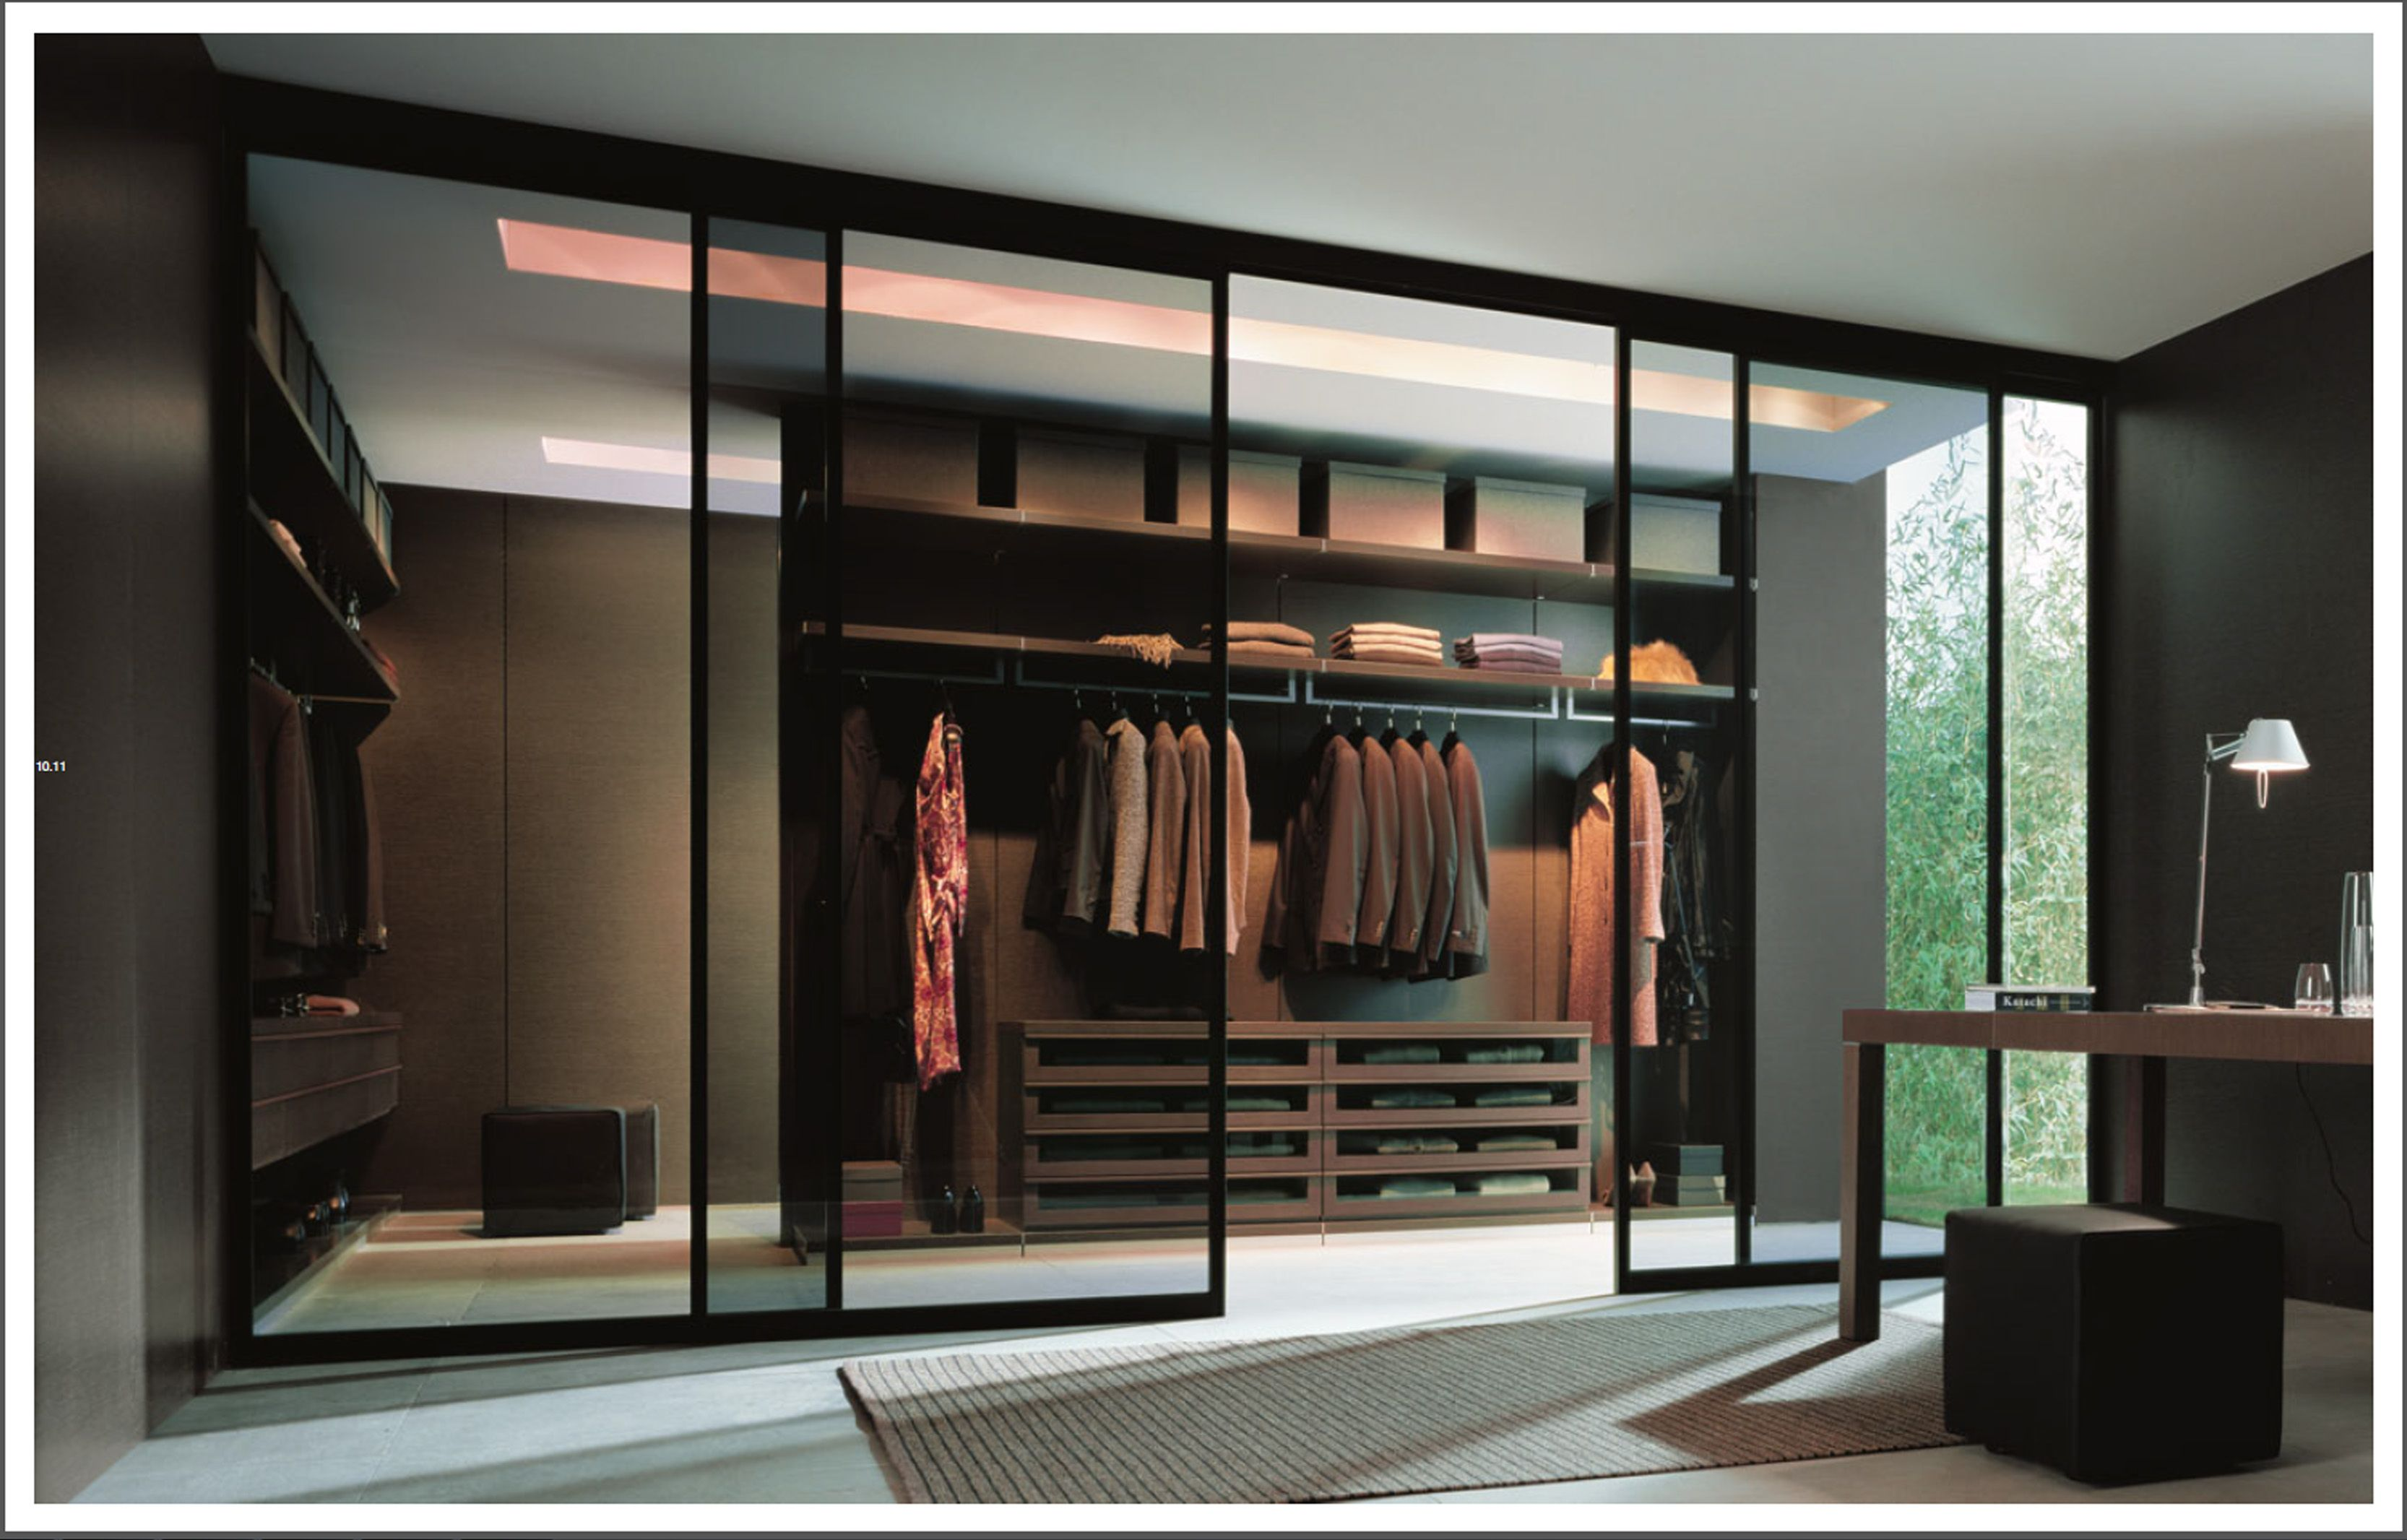 Poliform Ubik Inloopkast : Poliform dressing closet dressing room closet